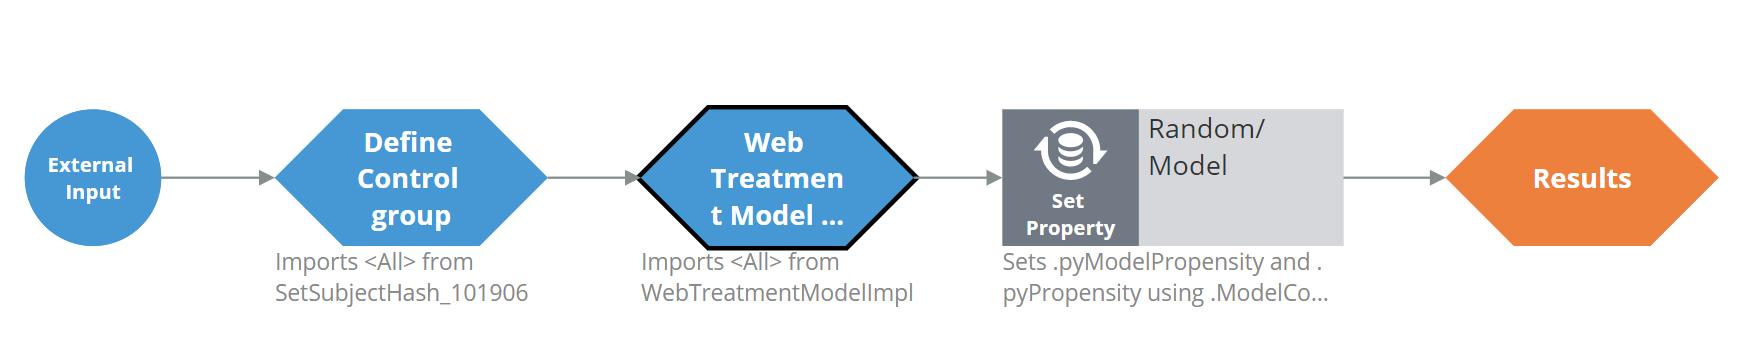 PredictWebPropensity strategy